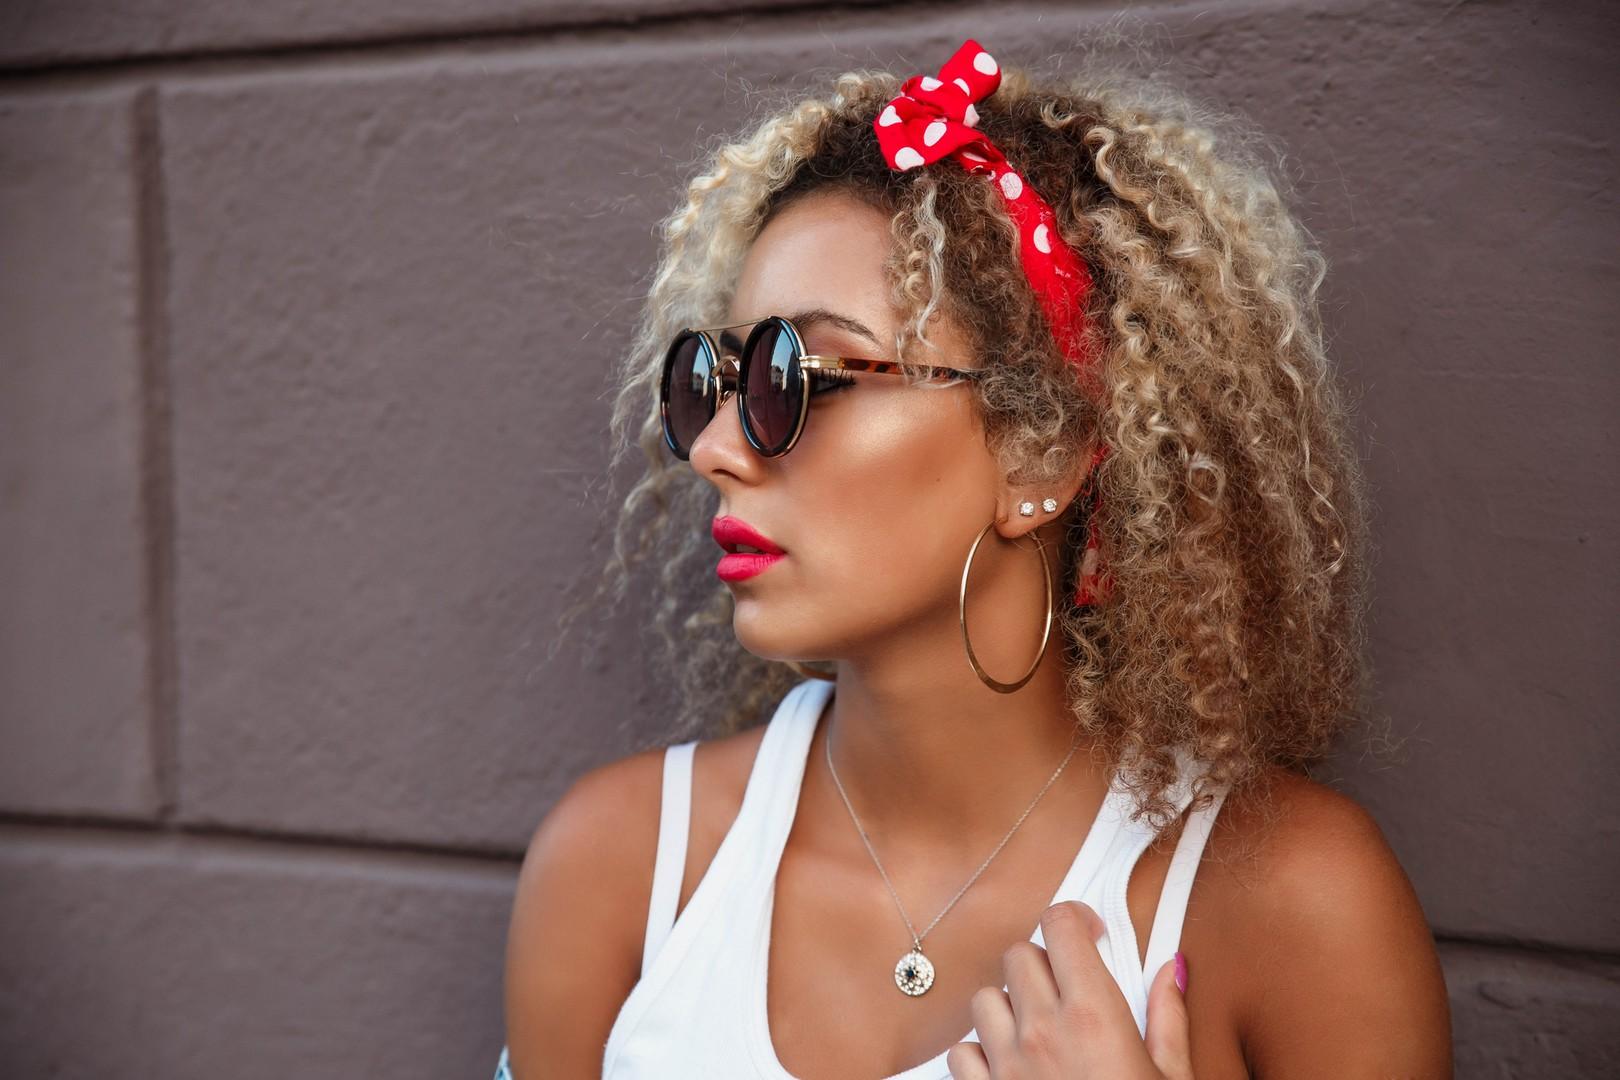 cortes de cabelo feminino medio 26 - Cortes de cabelo feminino médio: dicas e ideias para todo tipo de fio